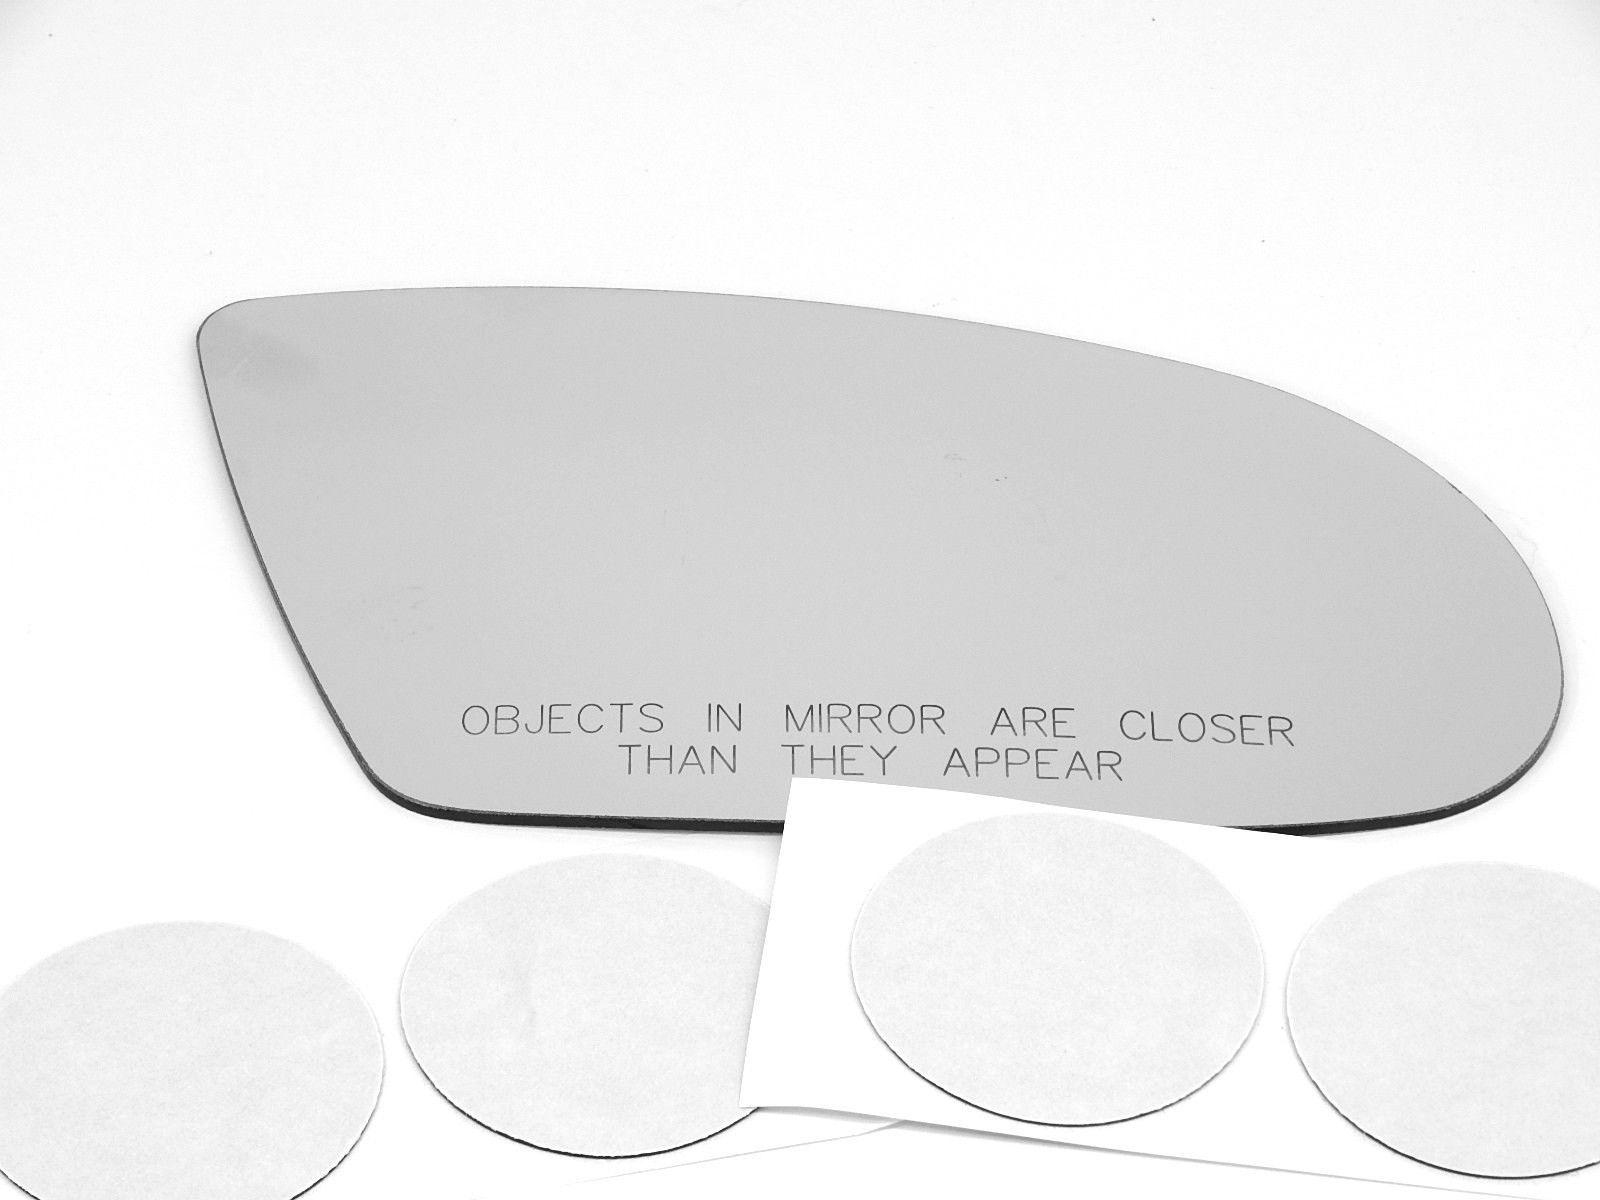 NEW Mirror Glass ADHESIVE 04-05 TOYOTA RAV4 RAV-4 Passenger Right Side